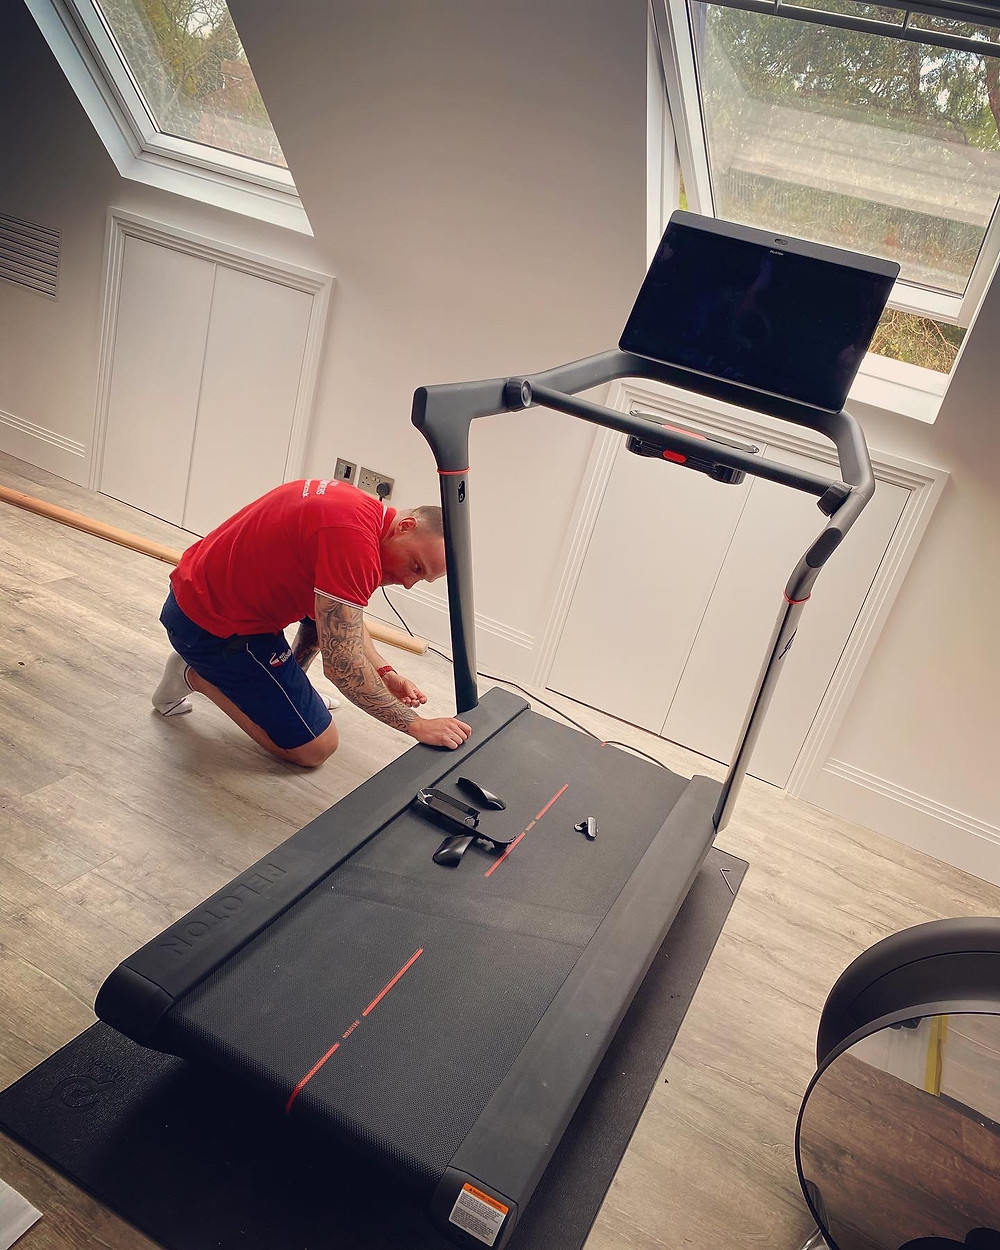 Peloton Treadmill London Removals - Man and Van - Storage